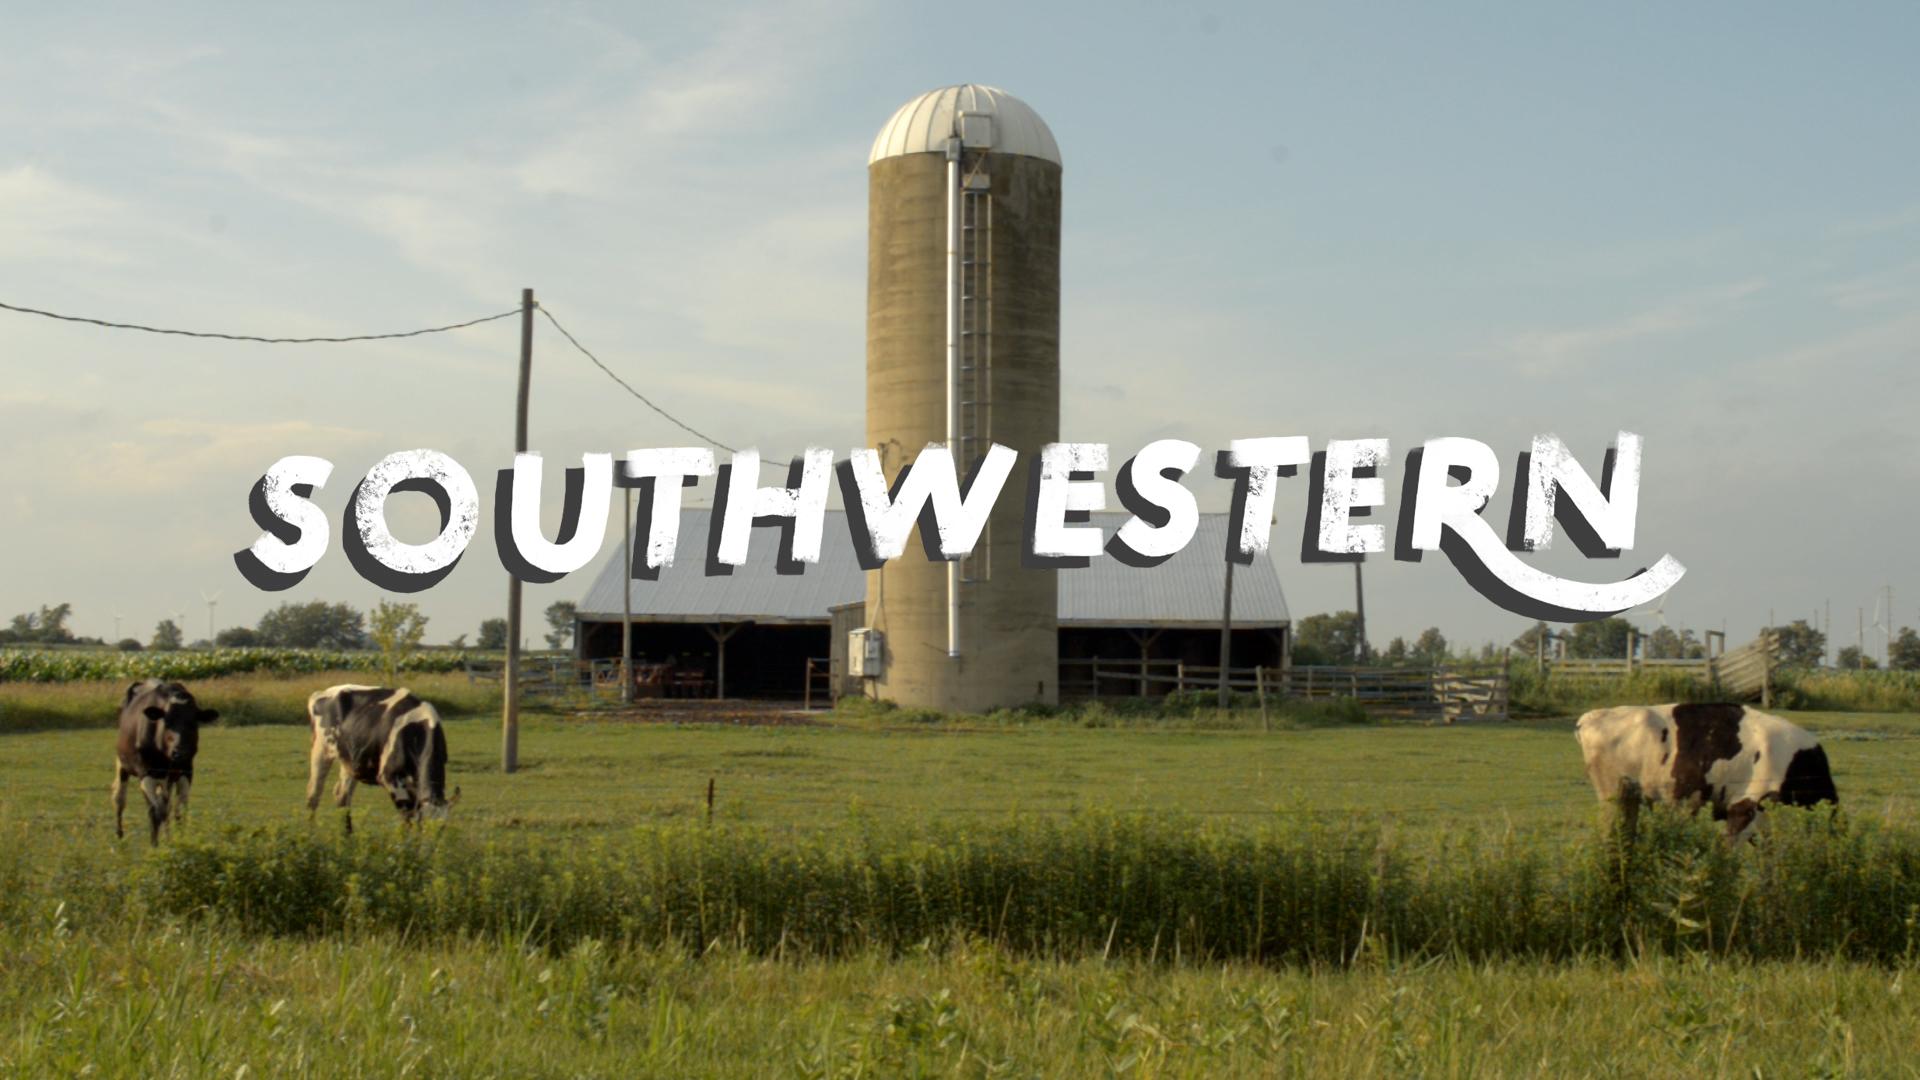 southwestern thumbnail.jpg